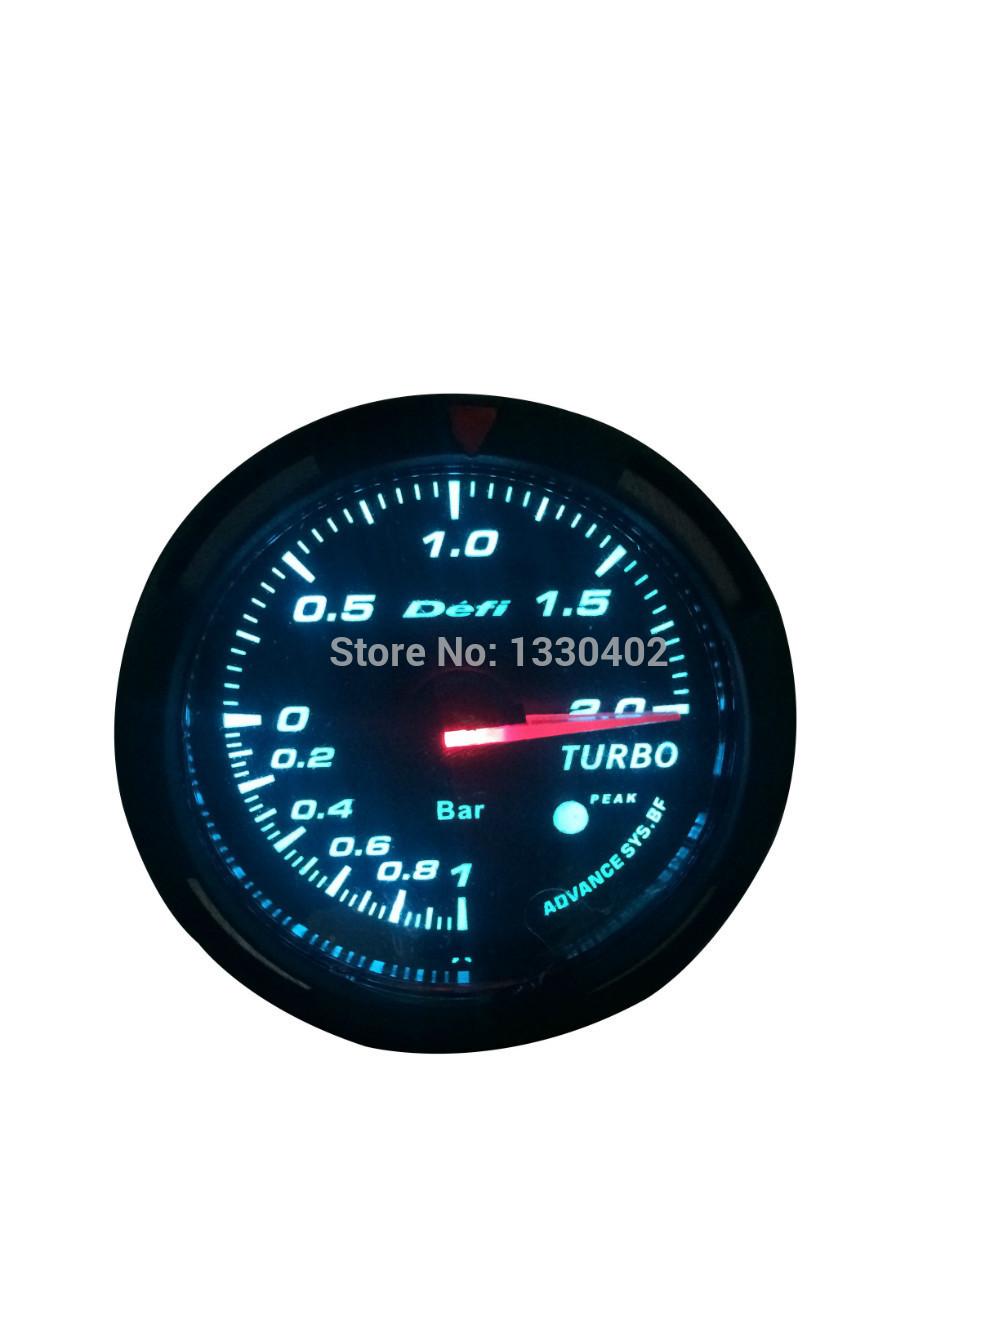 "2.5 "" DEFI ADVANCED BF Oil calibre temperatura bitola auto 60MM TURBO TACHOMETER VOLT TEMP ÁGUA OIL PRESS OIL TEMP VÁCUO(China (Mainland))"